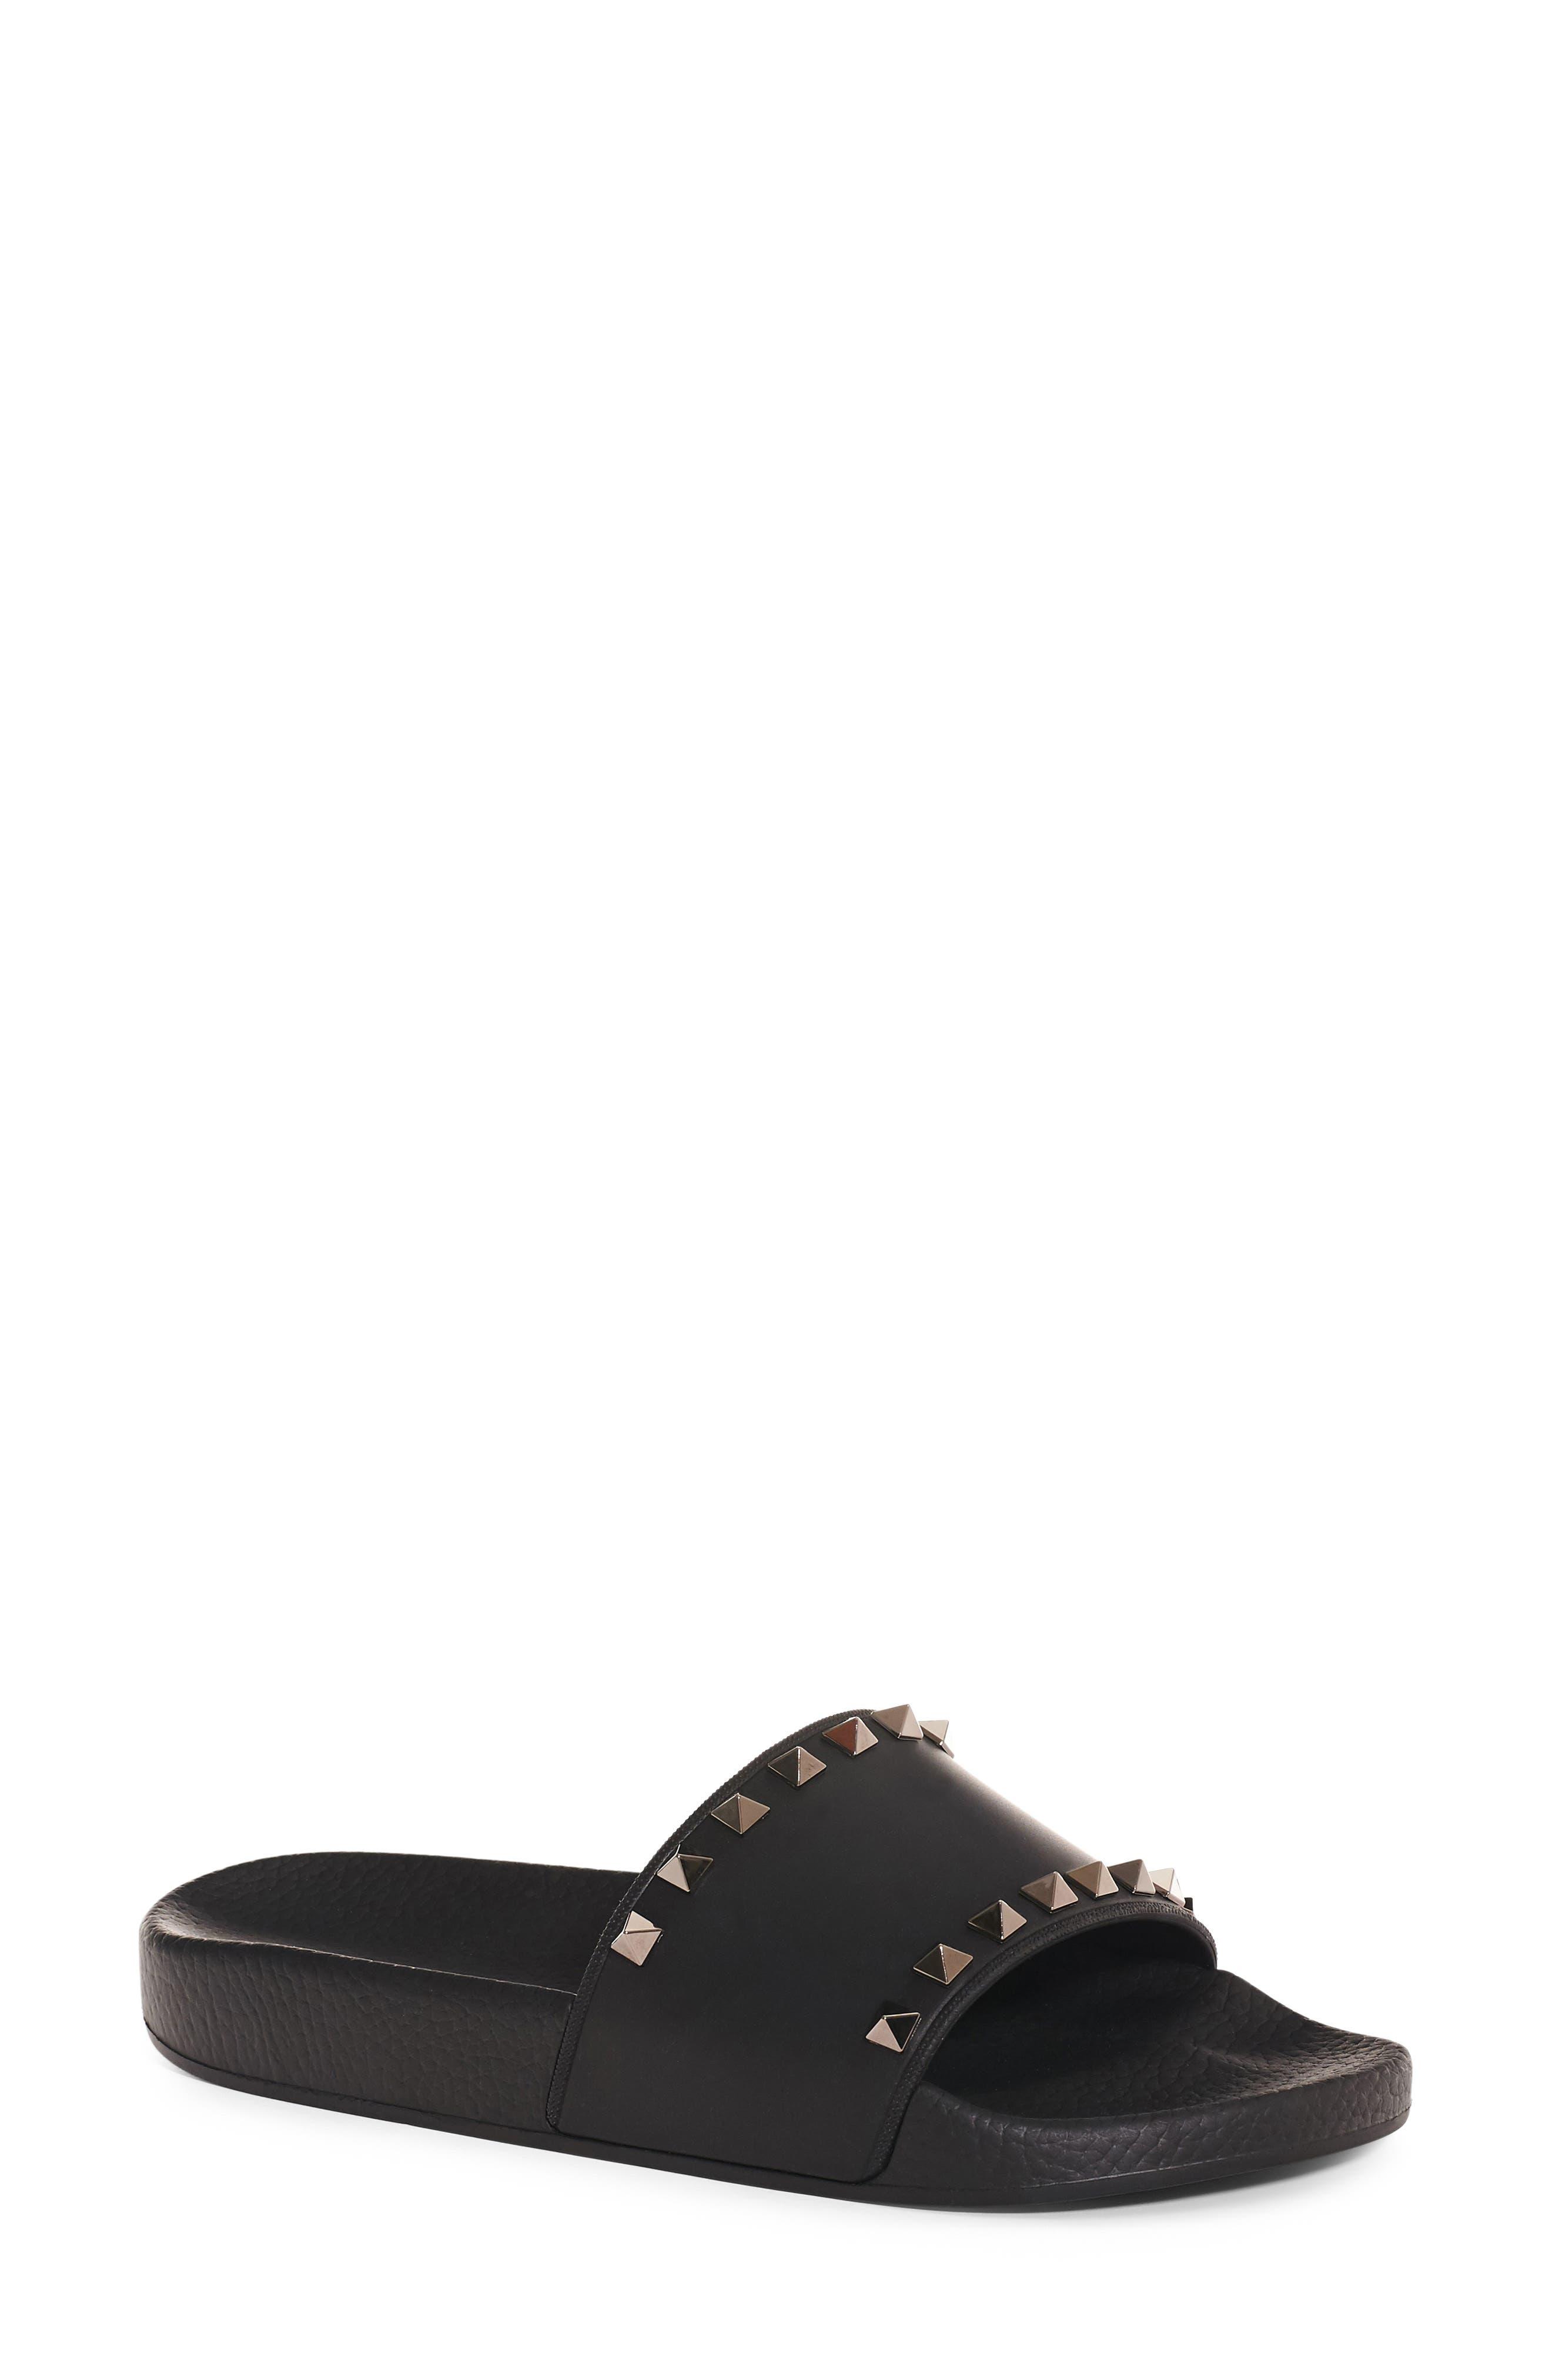 Women's Valentino Garavani Sandals and